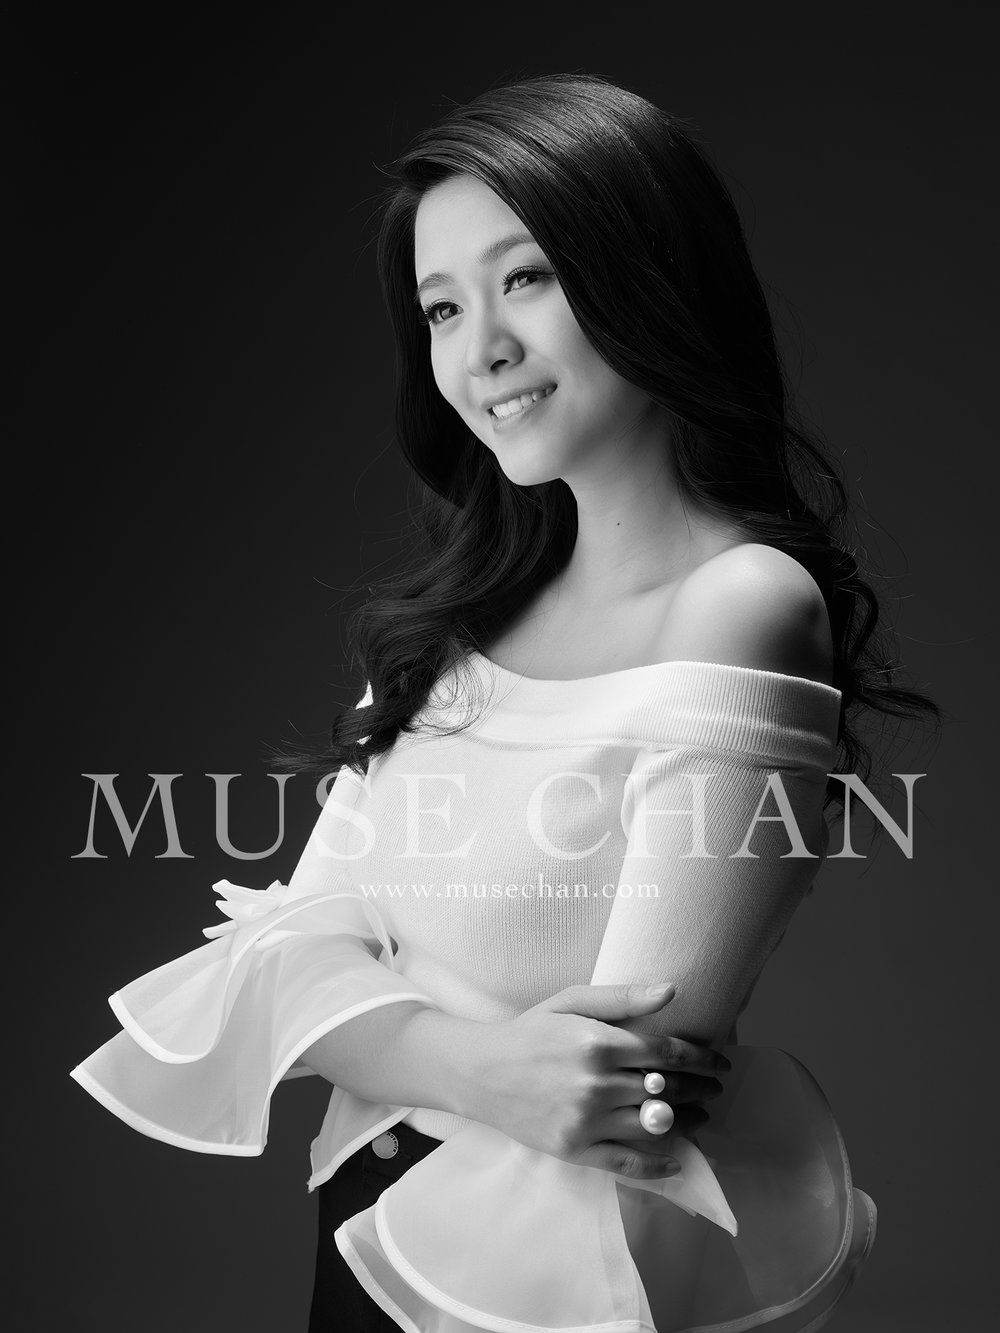 Kaman Kong - Muse Chan